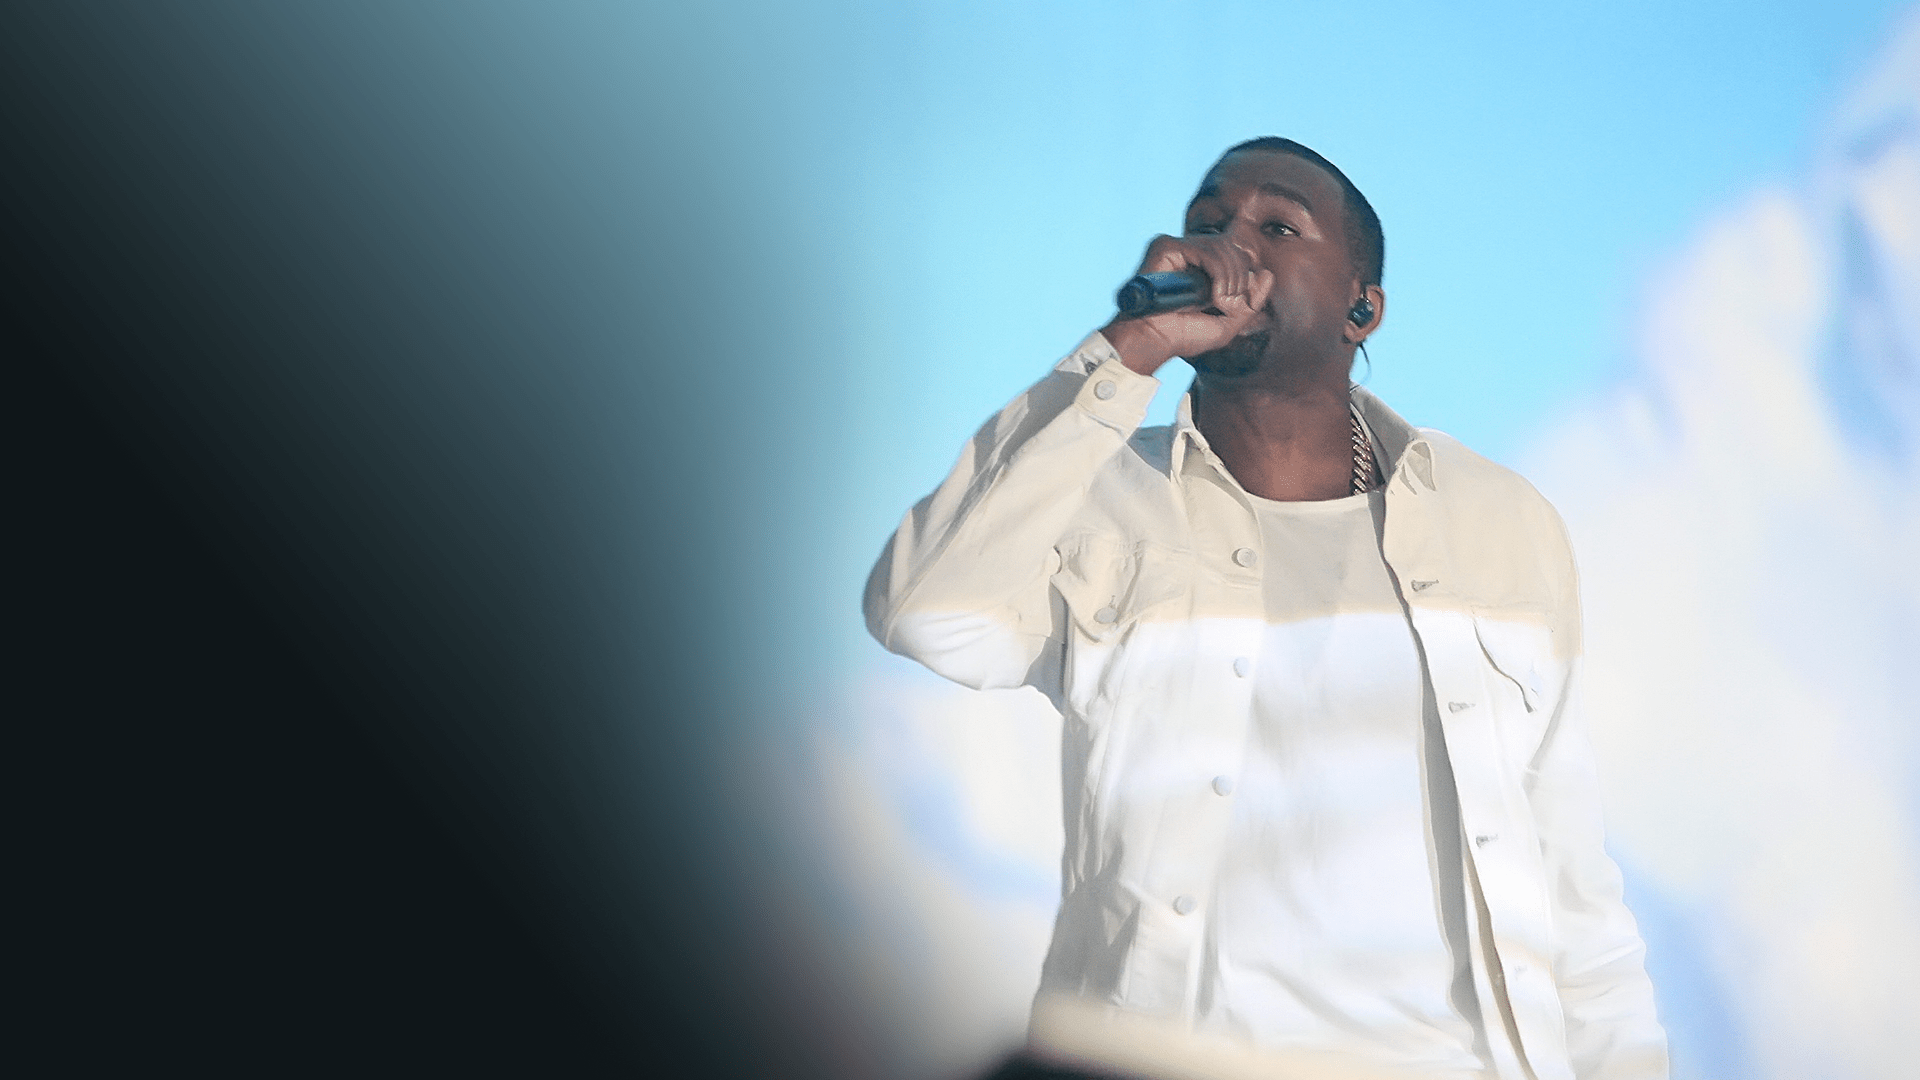 Kanye West Performs Jesus Walks at World Music Awards